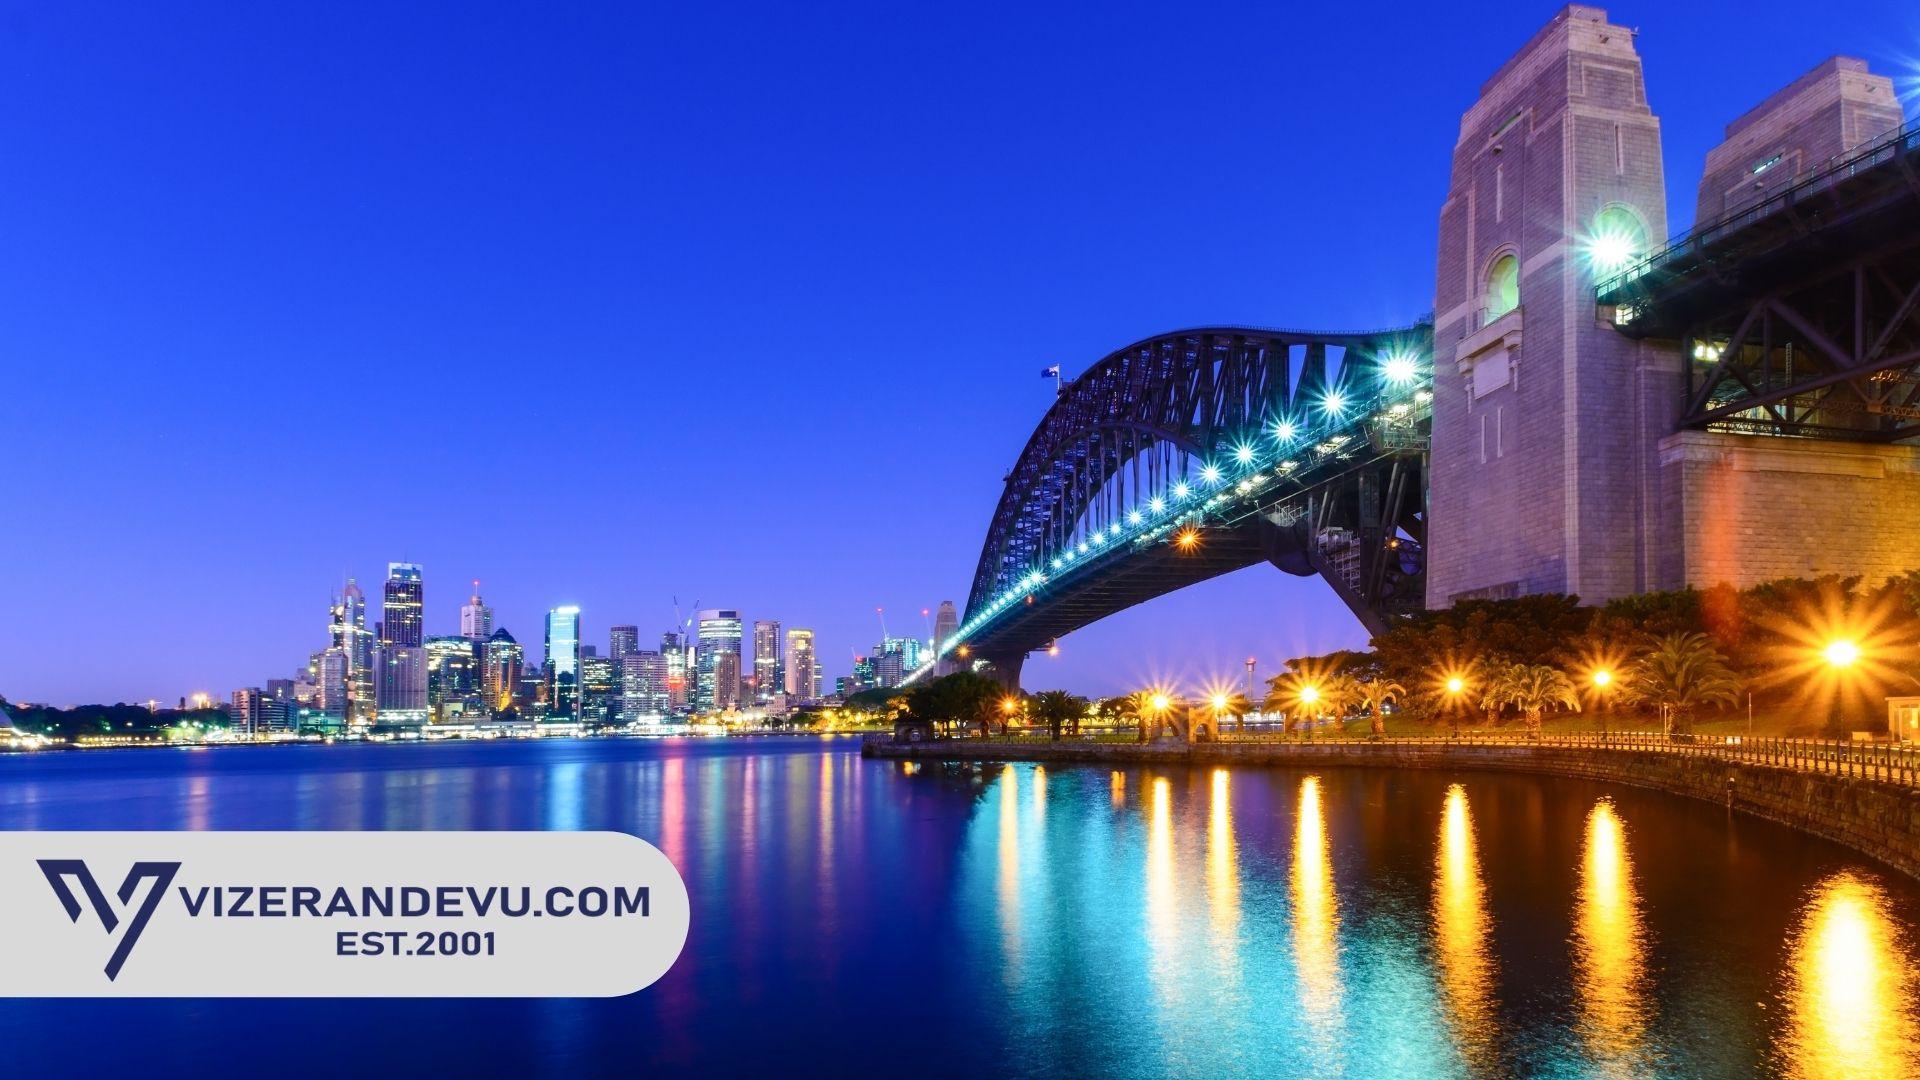 Avustralya Vizesi: Randevu ve Başvuru (2021)